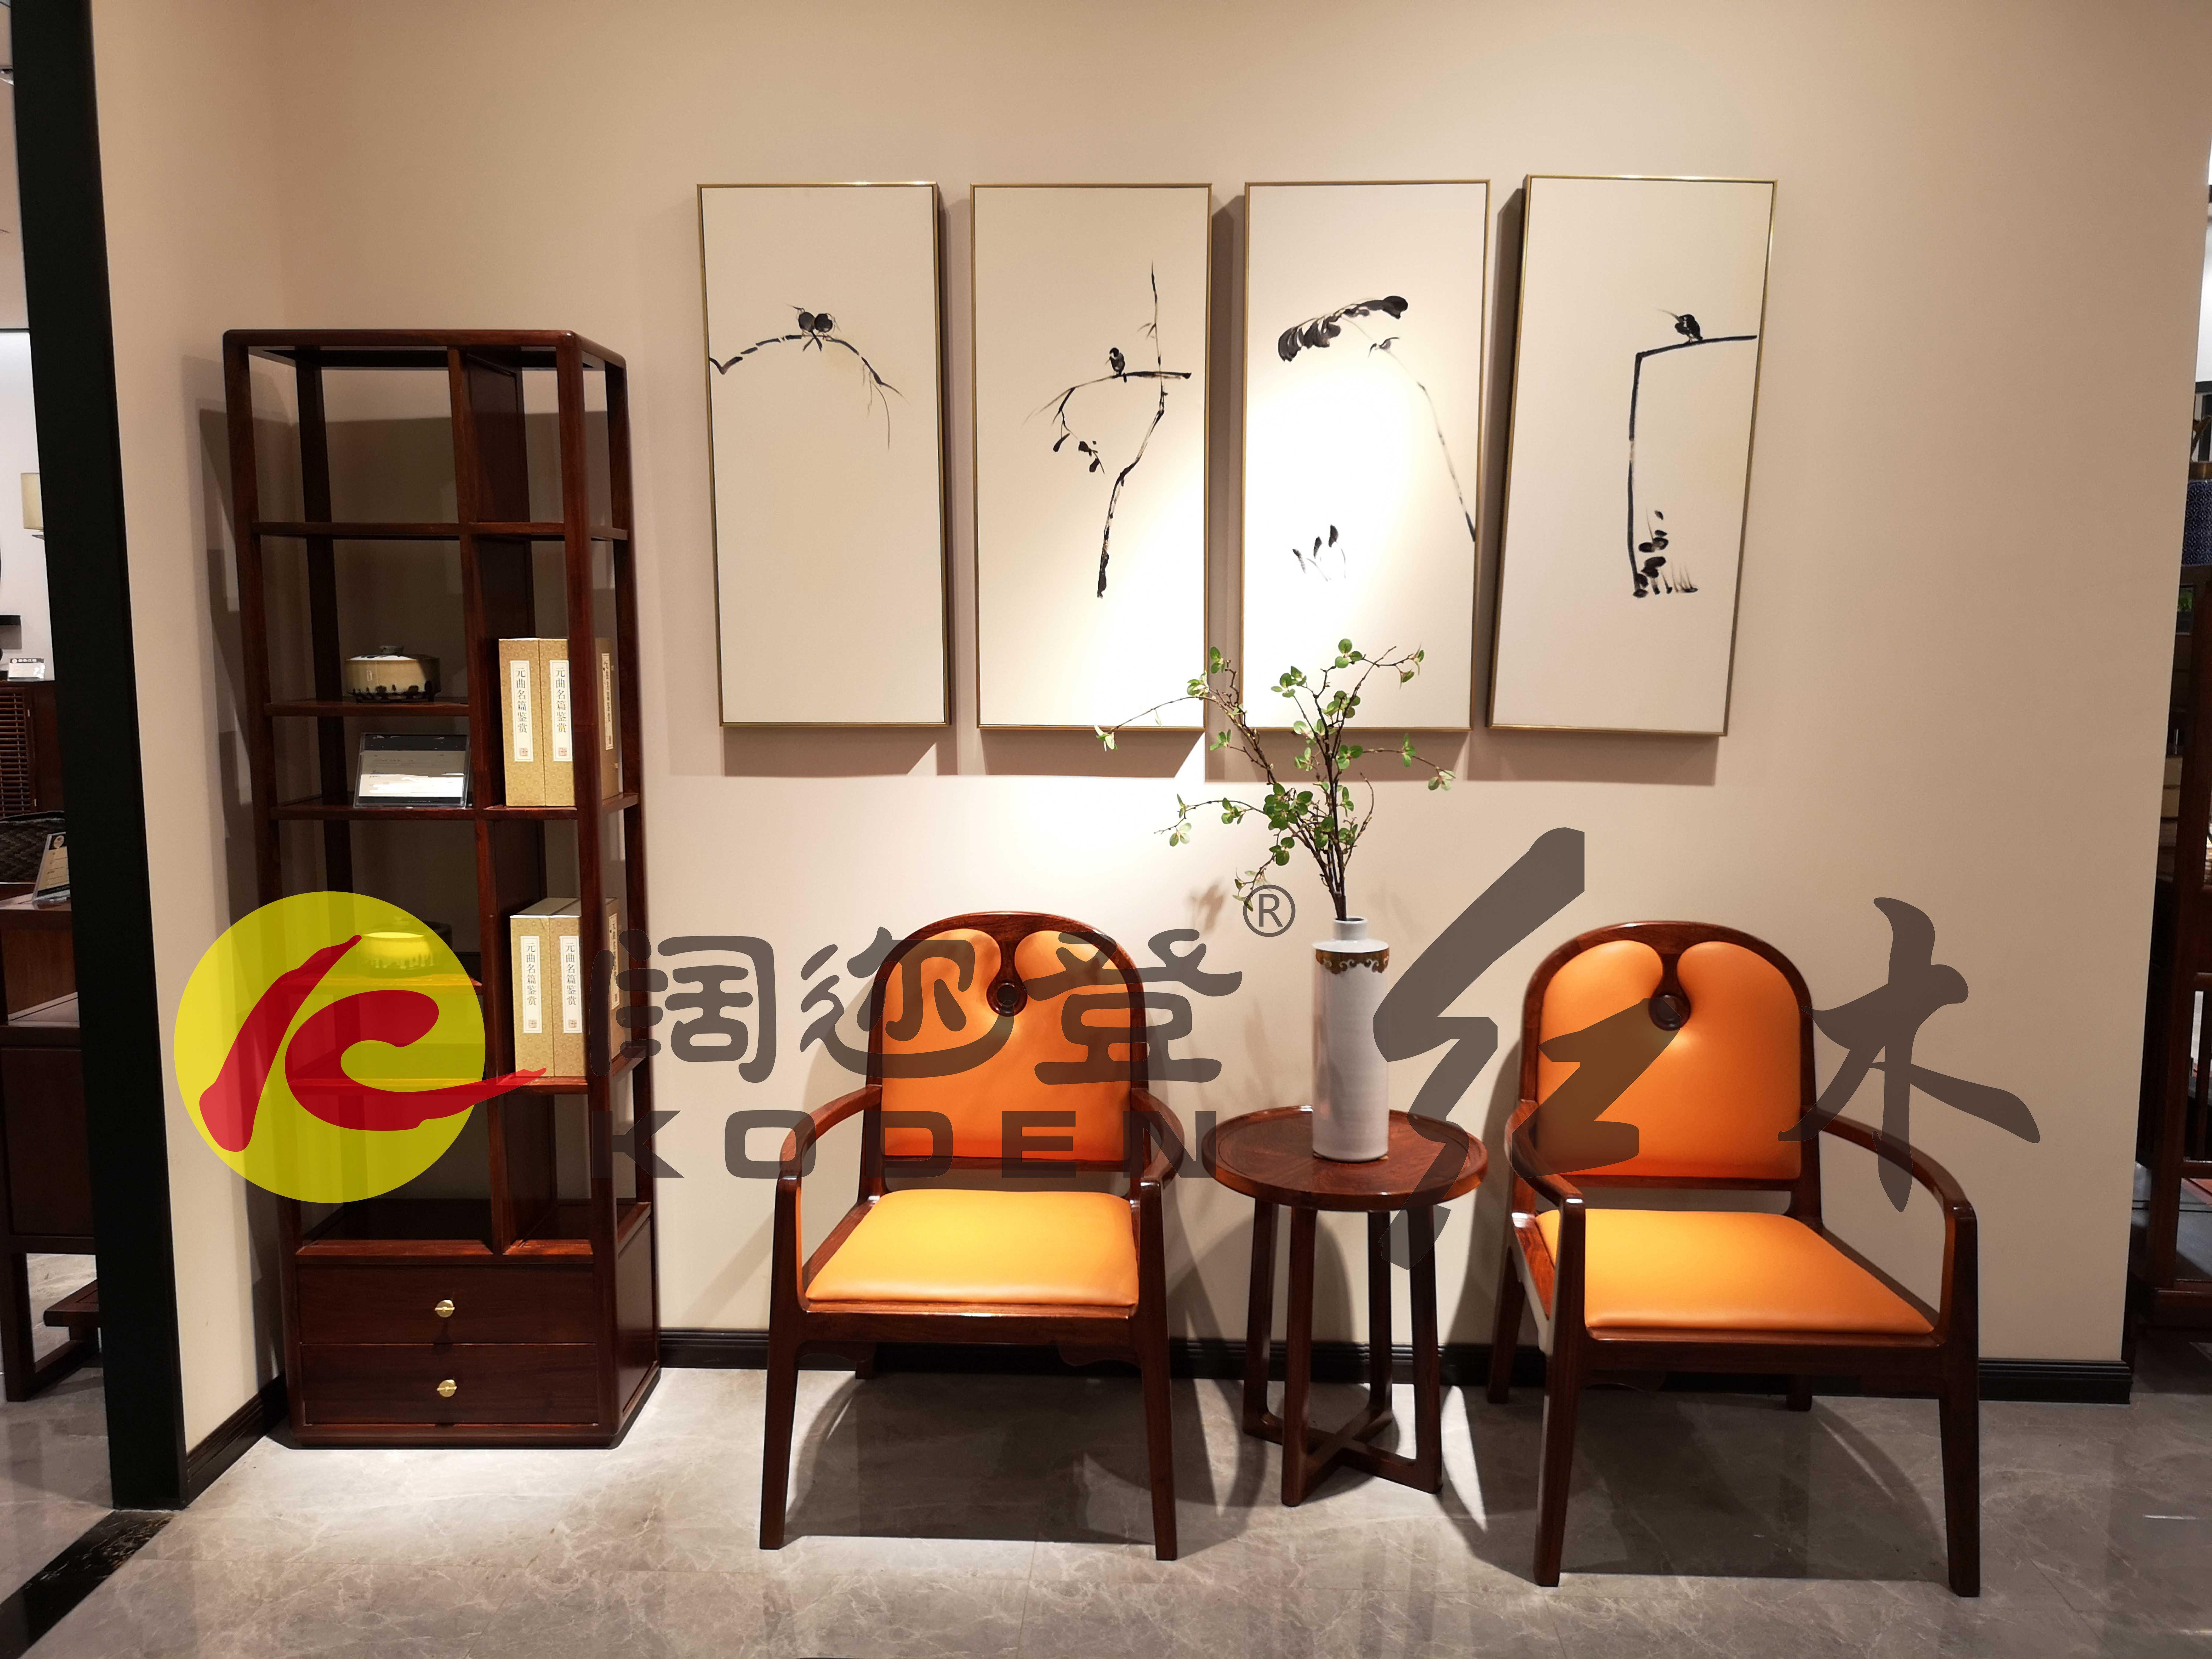 2-225-CW-MSJNXLXXY墨色江南系列休闲椅3件套拷贝